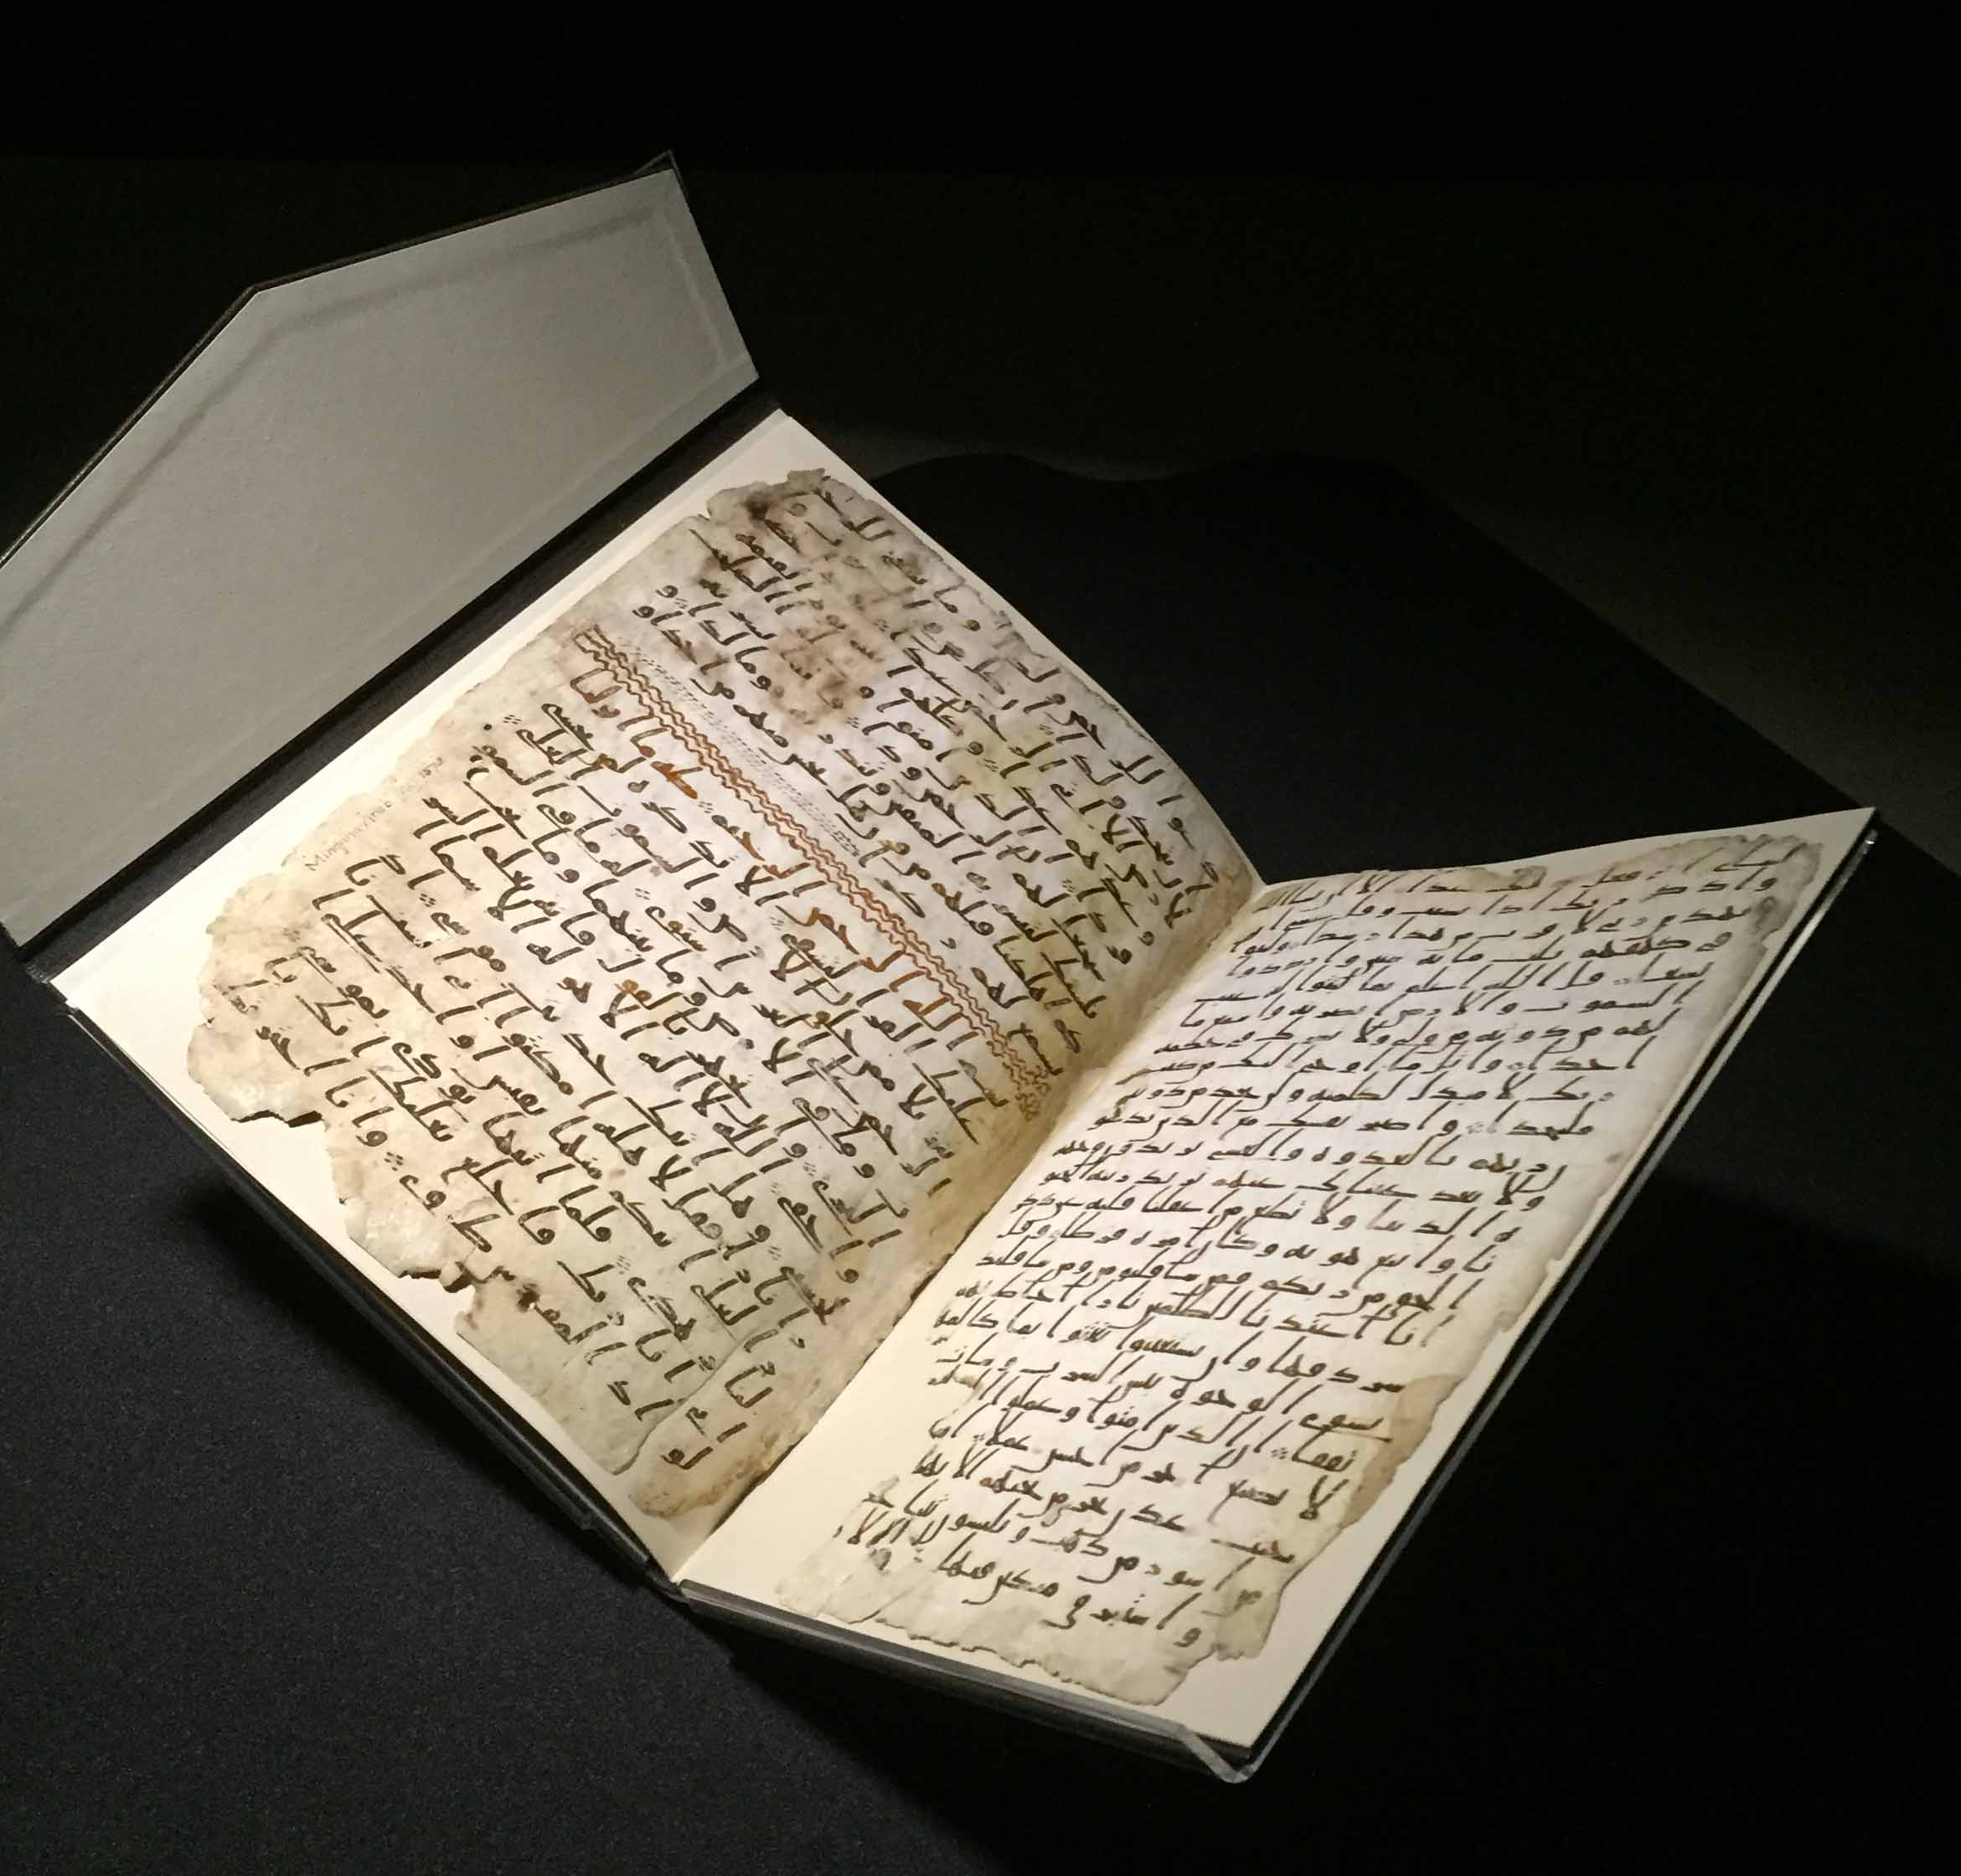 Birmingham Qur'an Digital Exhibition UAE